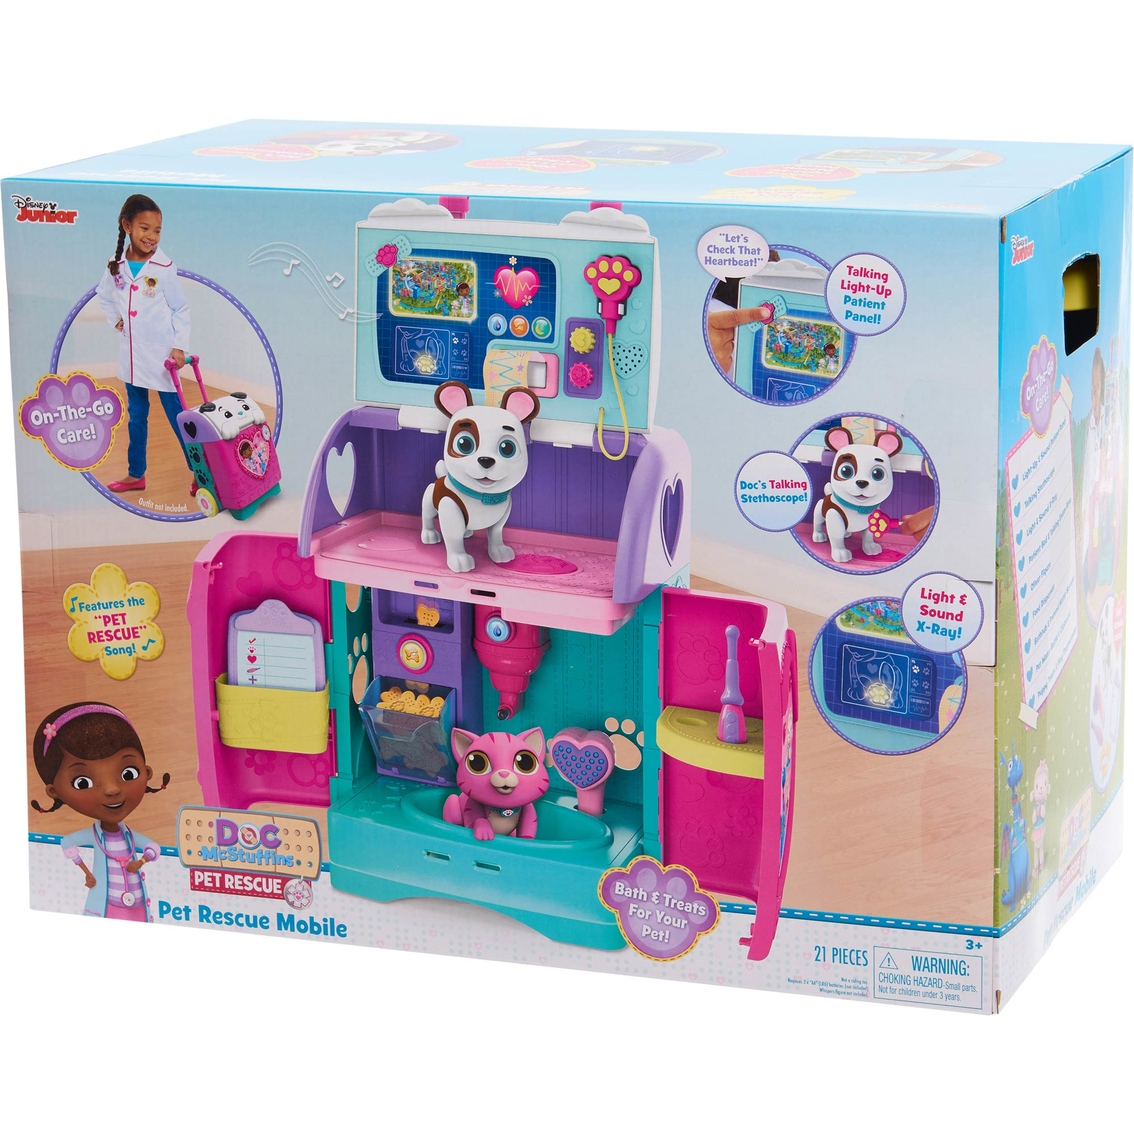 Hasbro Disney Junior Doc McStuffins Pet Rescue Mobile Clinic